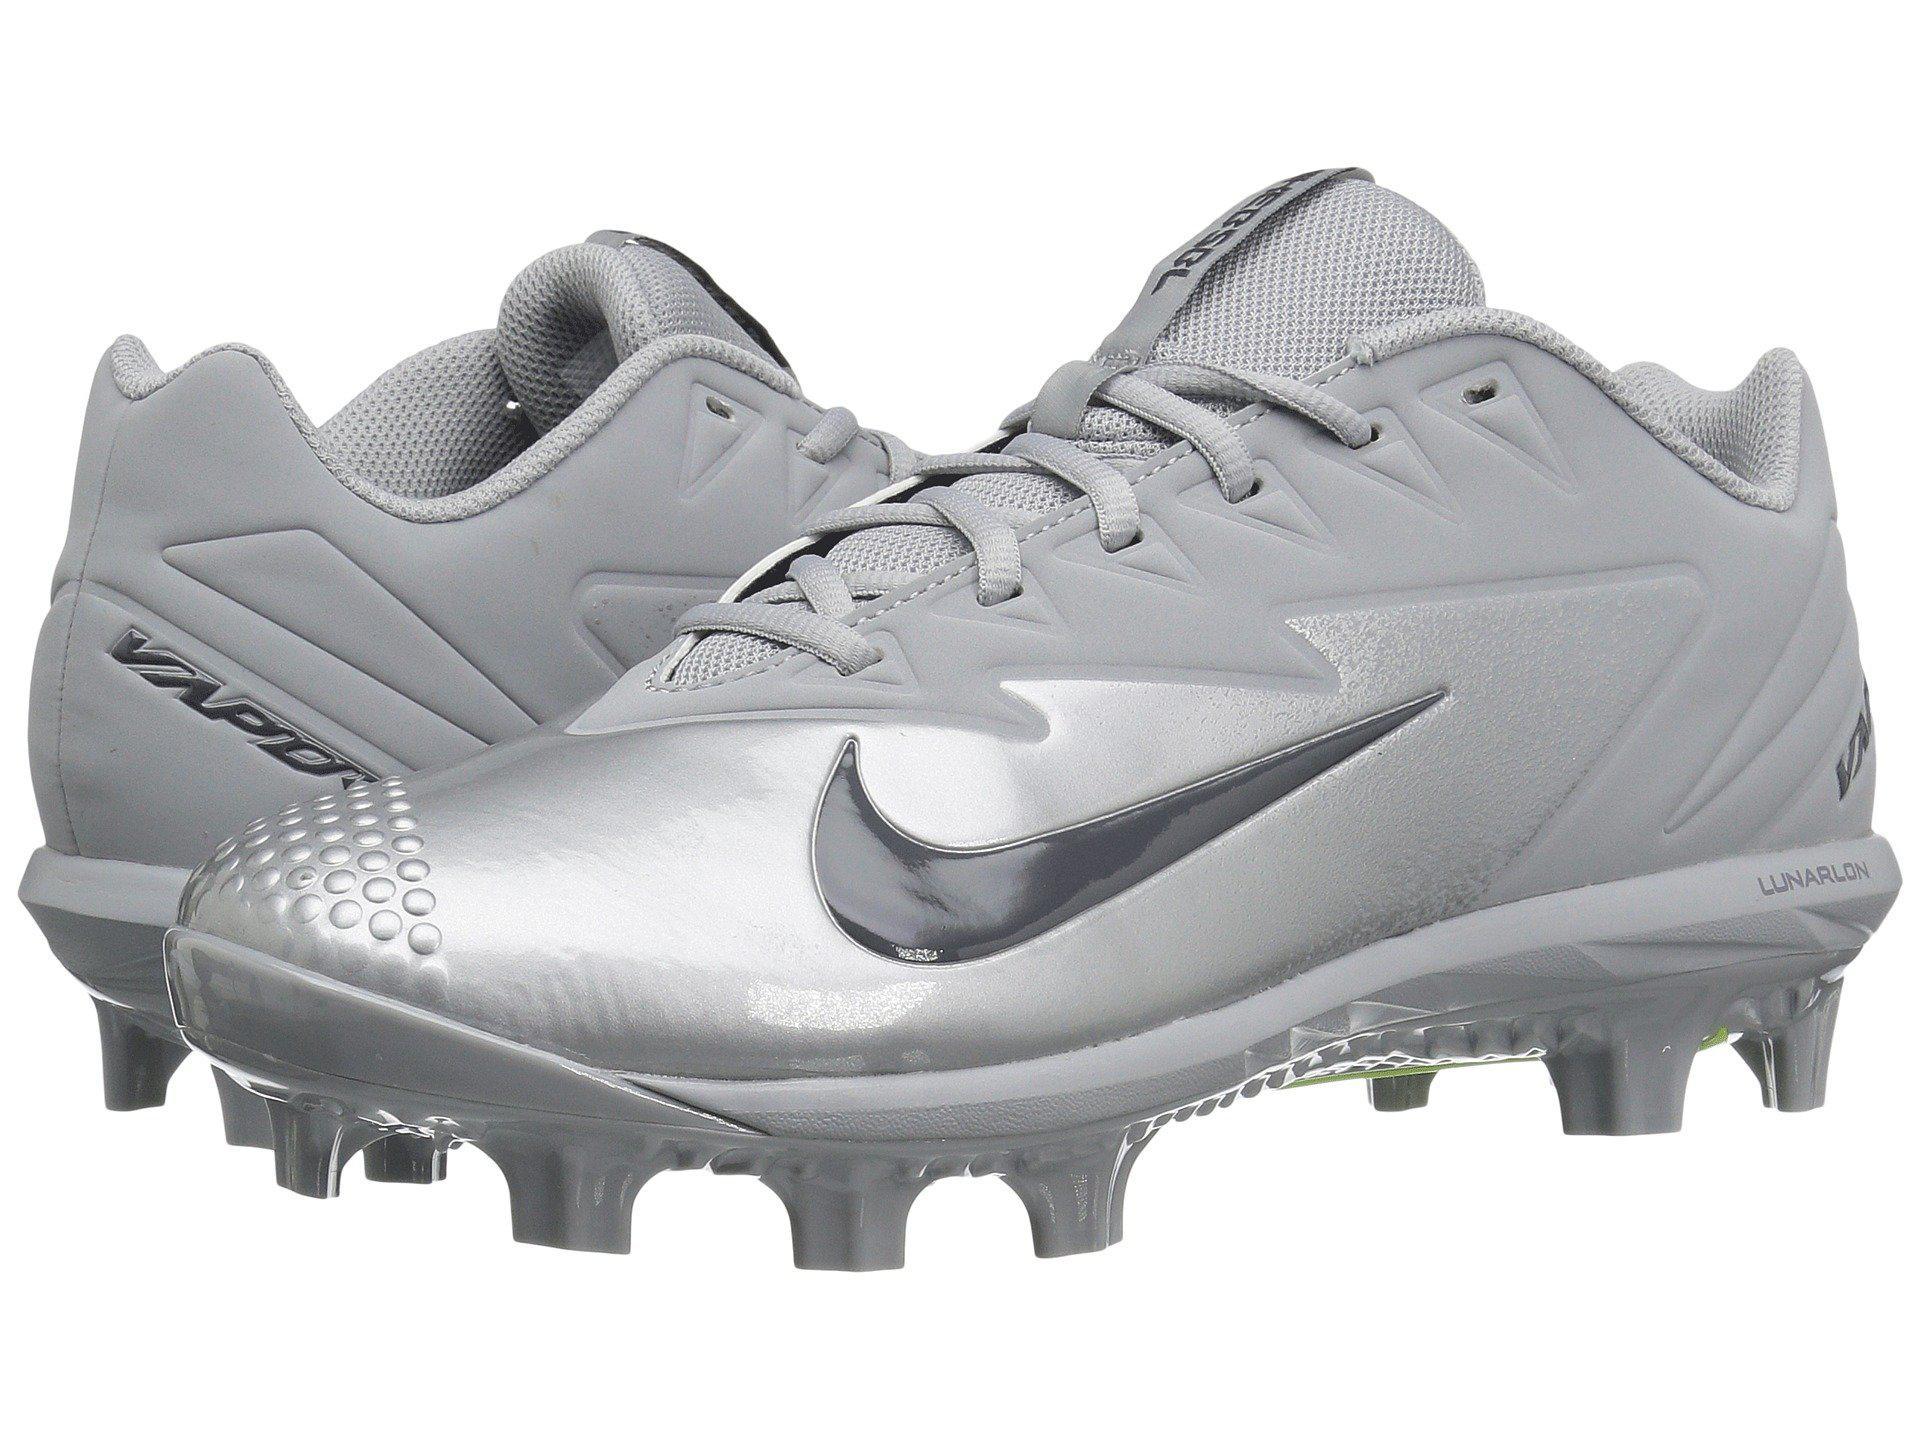 7fab01abb Nike Vapor Ultrafly Pro Mcs in Gray for Men - Lyst